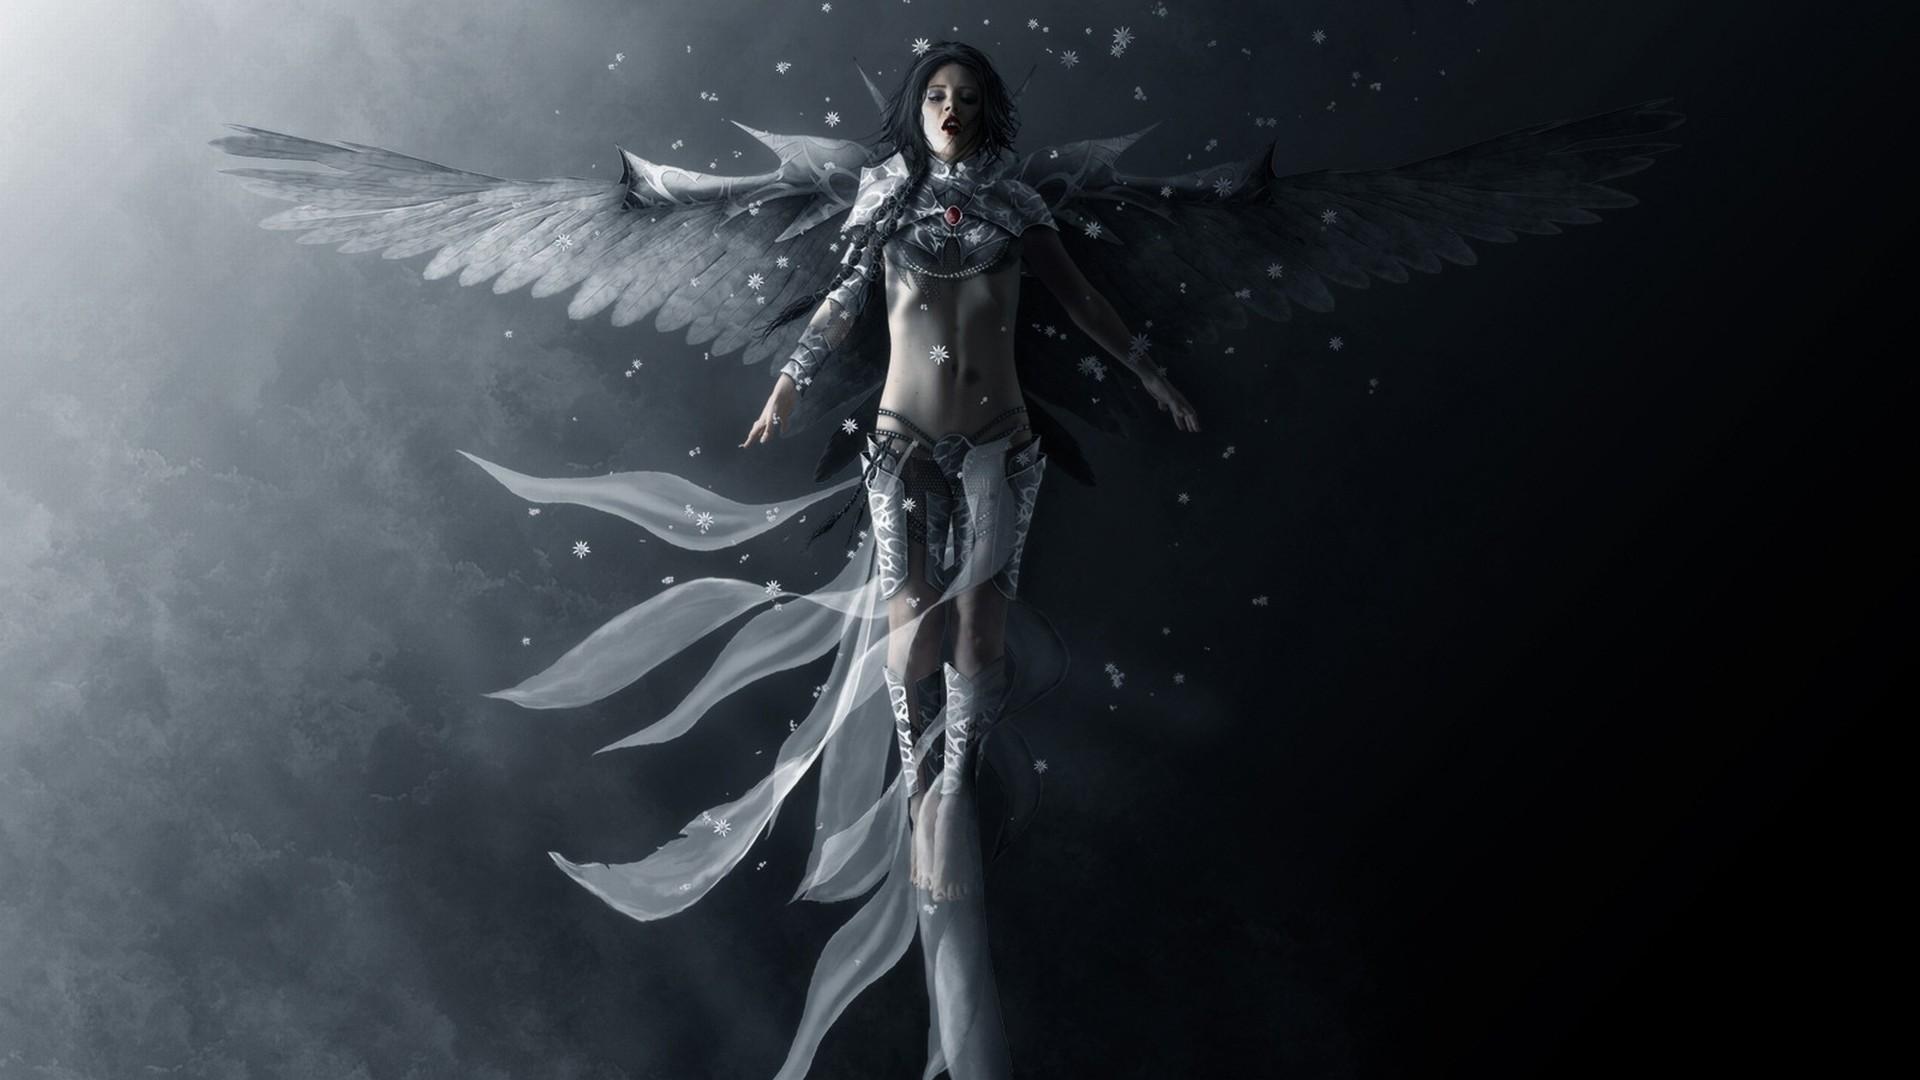 Angel Wings Wallpaper 70 Images